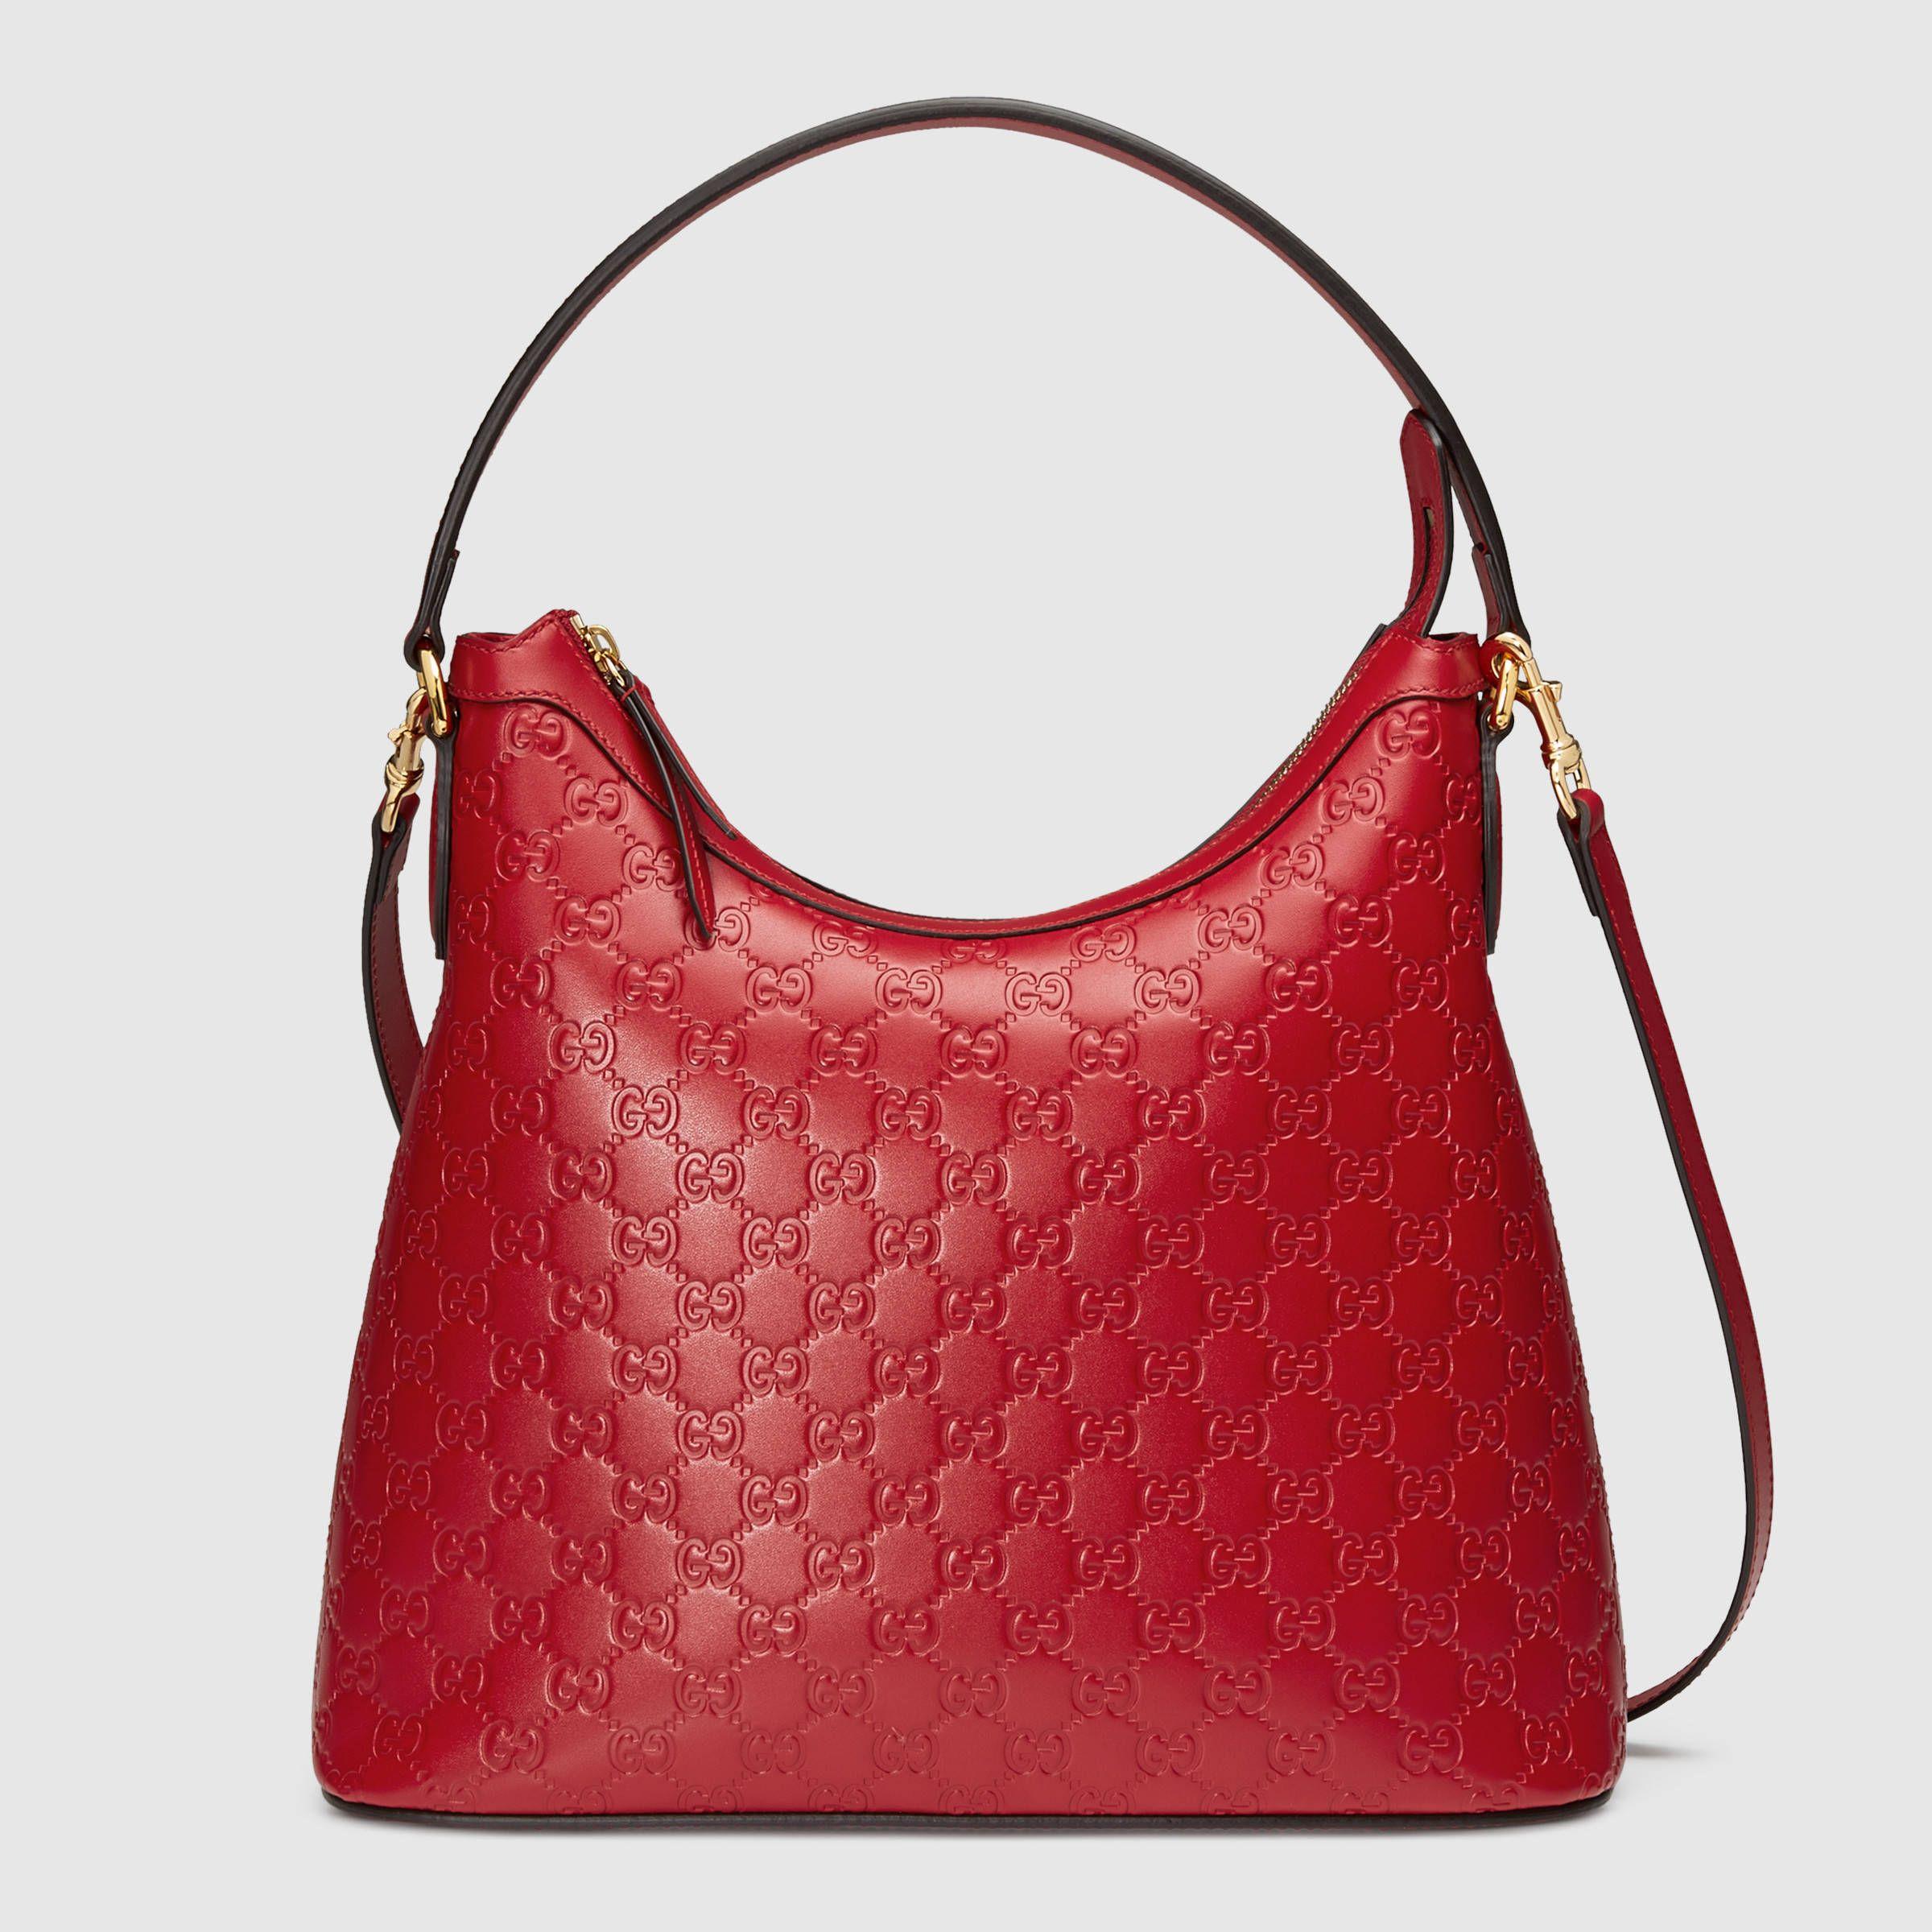 Gucci Women - Gucci Signature hobo - 414930CWC1G6433 | Handbags ...